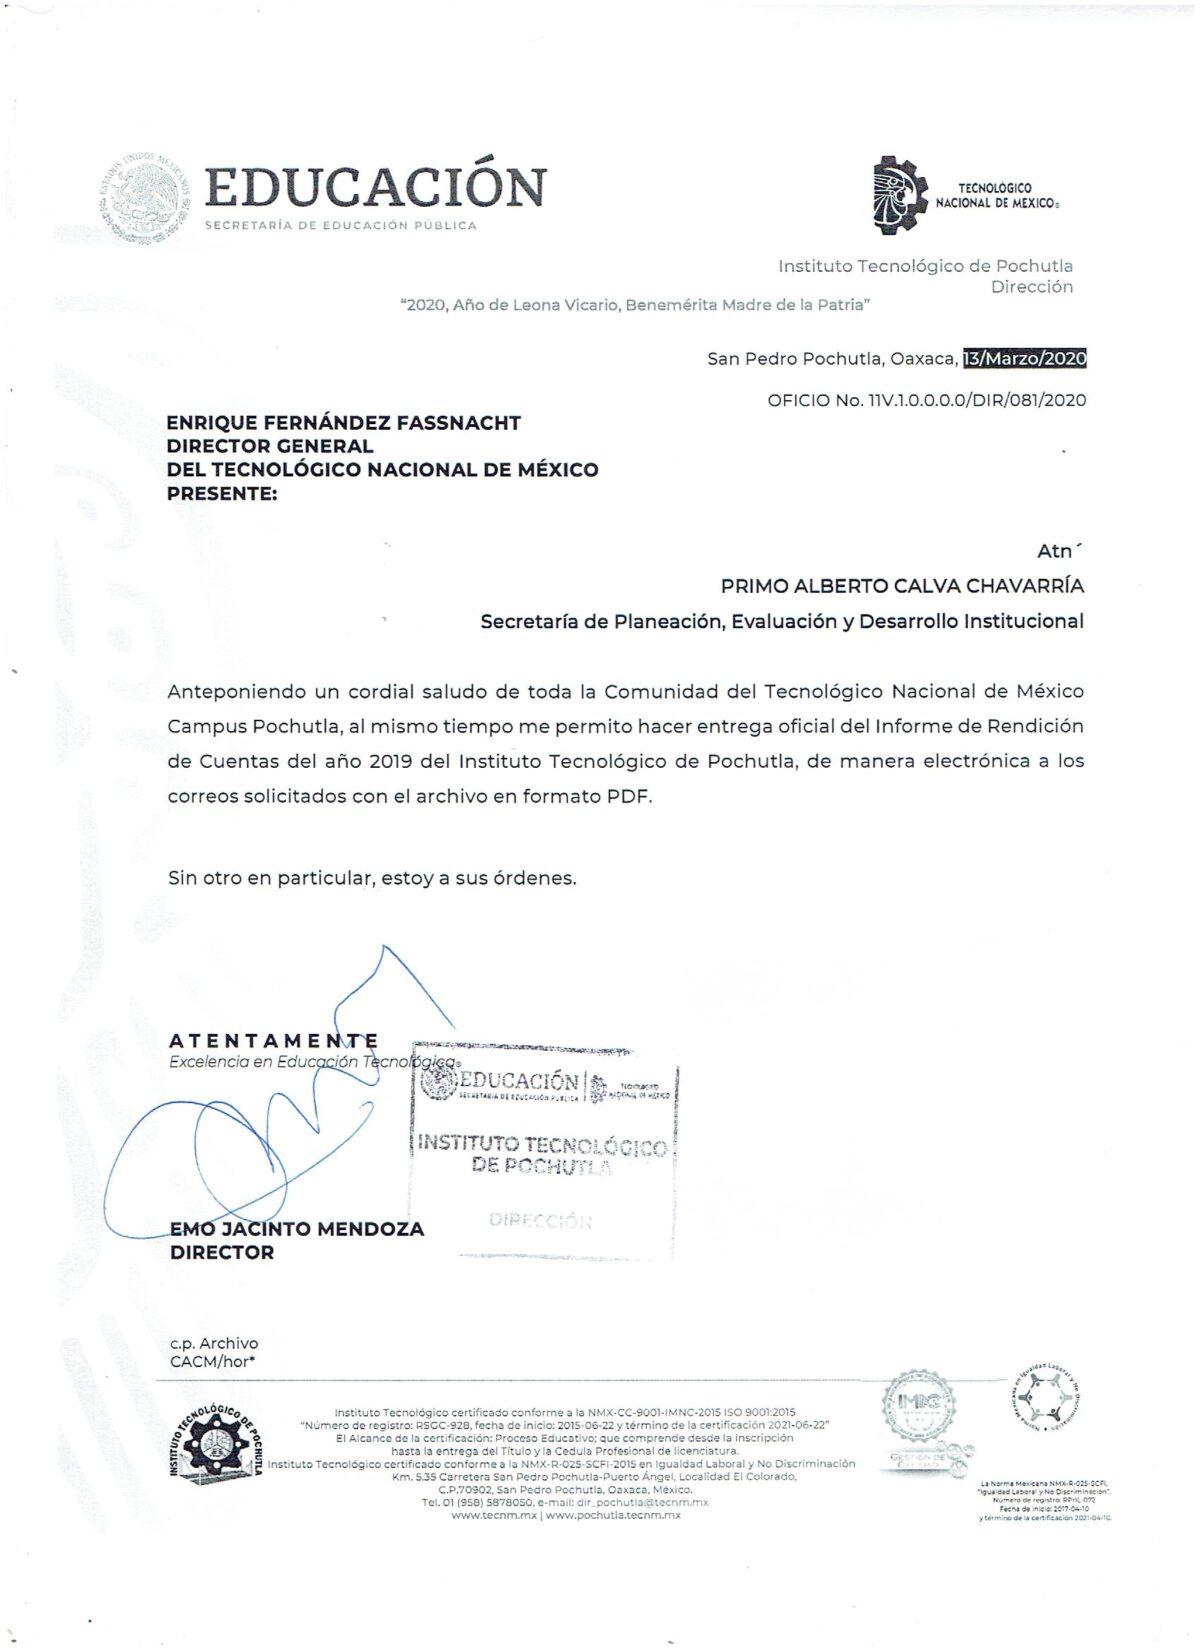 OFICIO DE ENTREGA DE IRC 2019